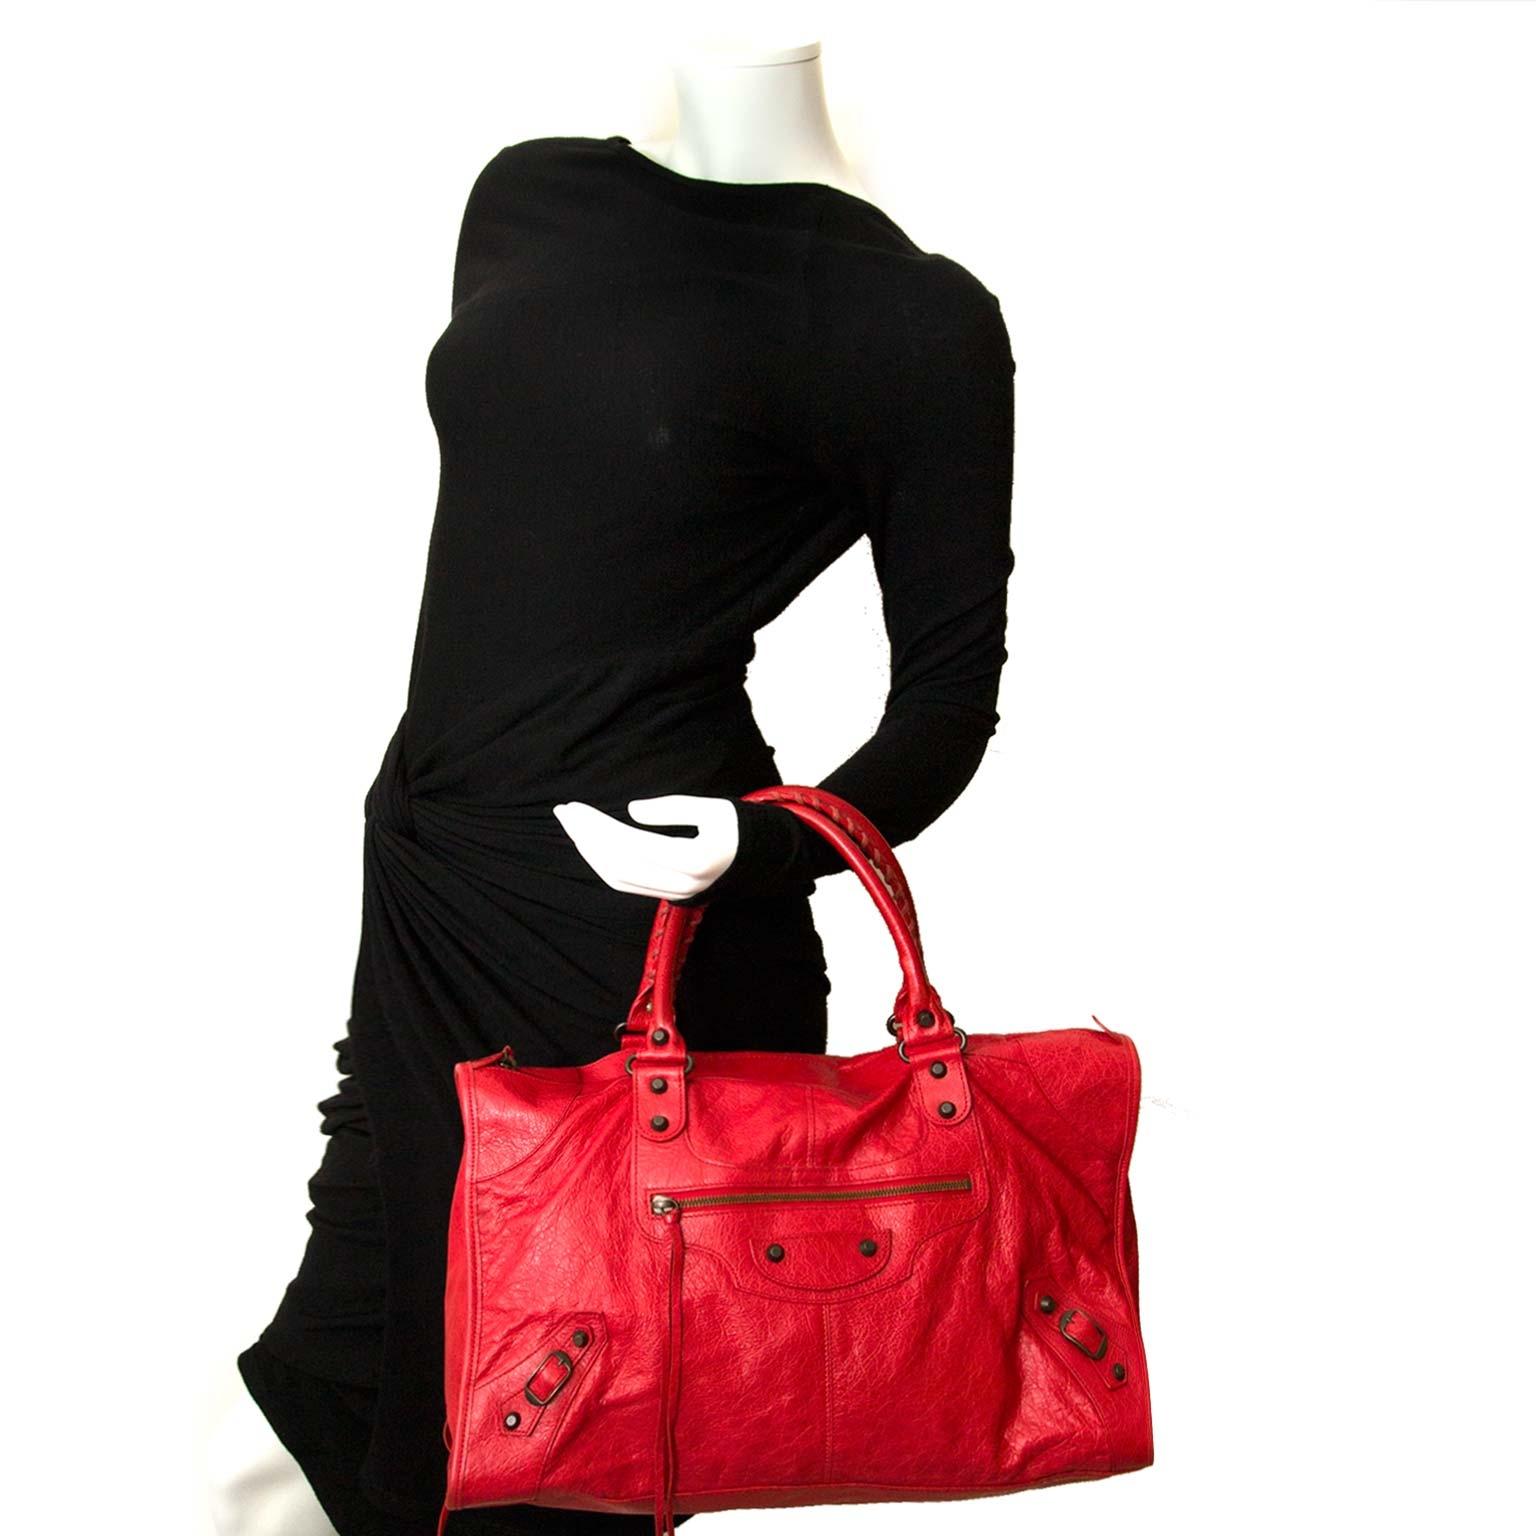 9e8457420a ... balenciaga red leather work bag now for sale at labellov vintage fashion  webshop belgium